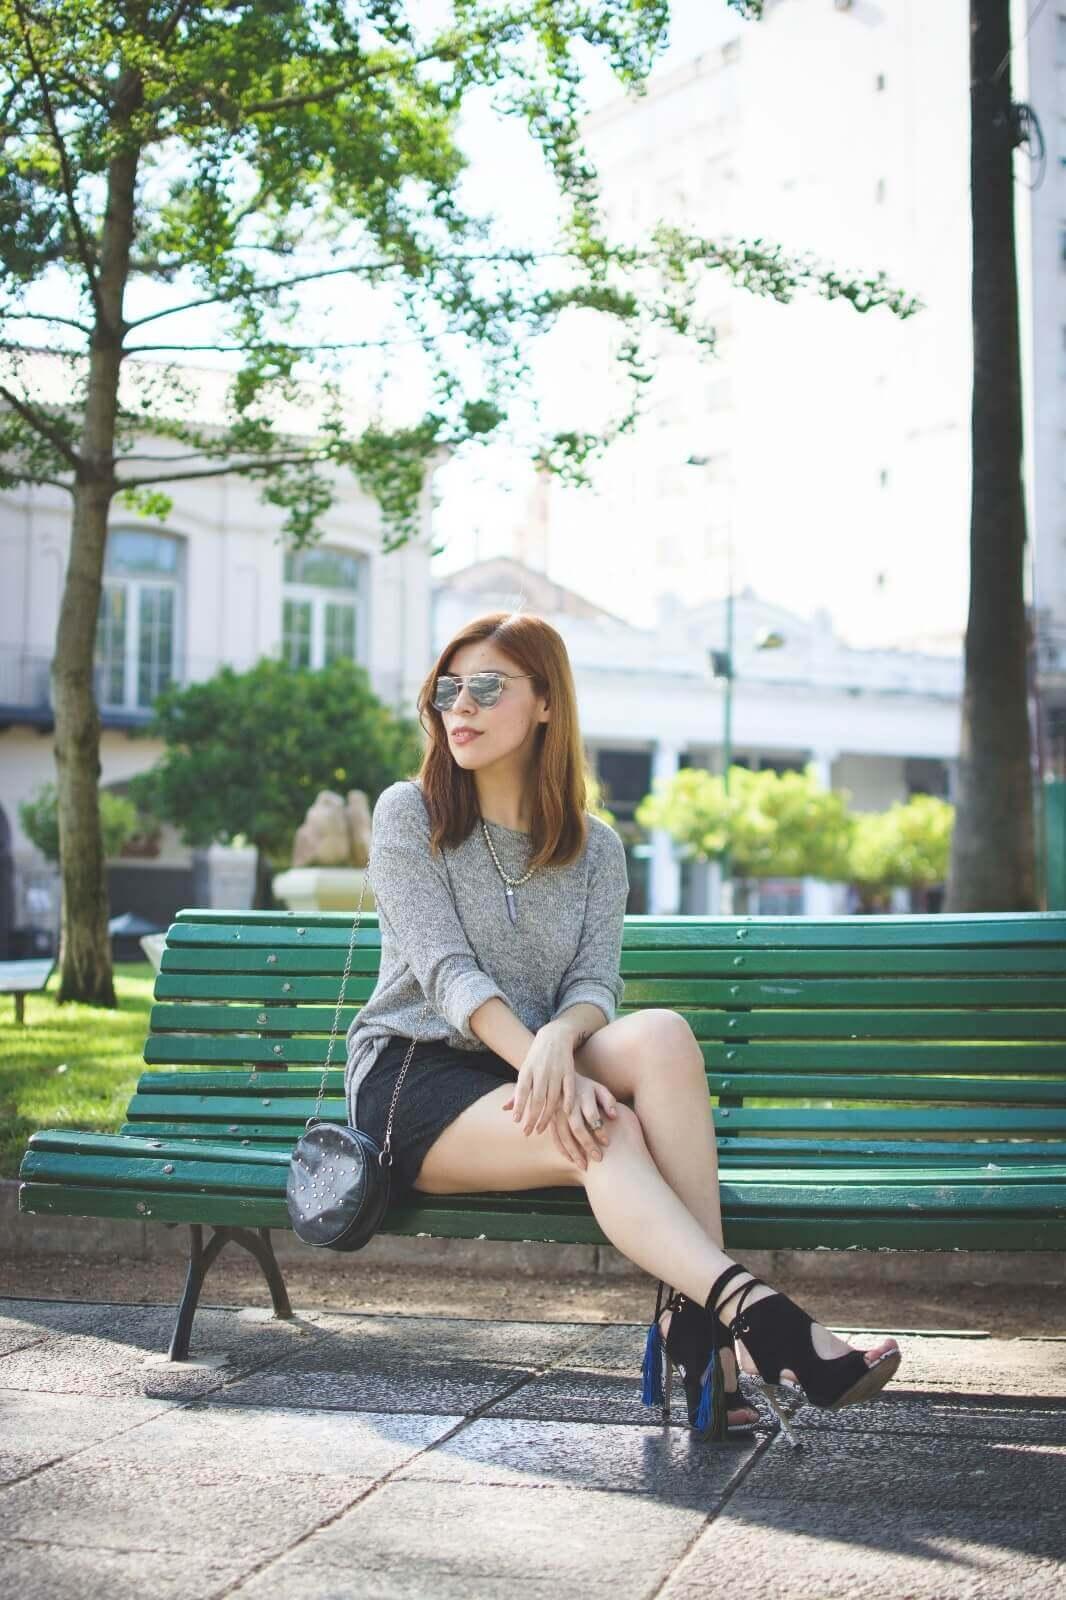 zaful-statement-shoes-silver-mirrored-sunglasses-deborah-ferrero-streetstyle-style-by-deb01